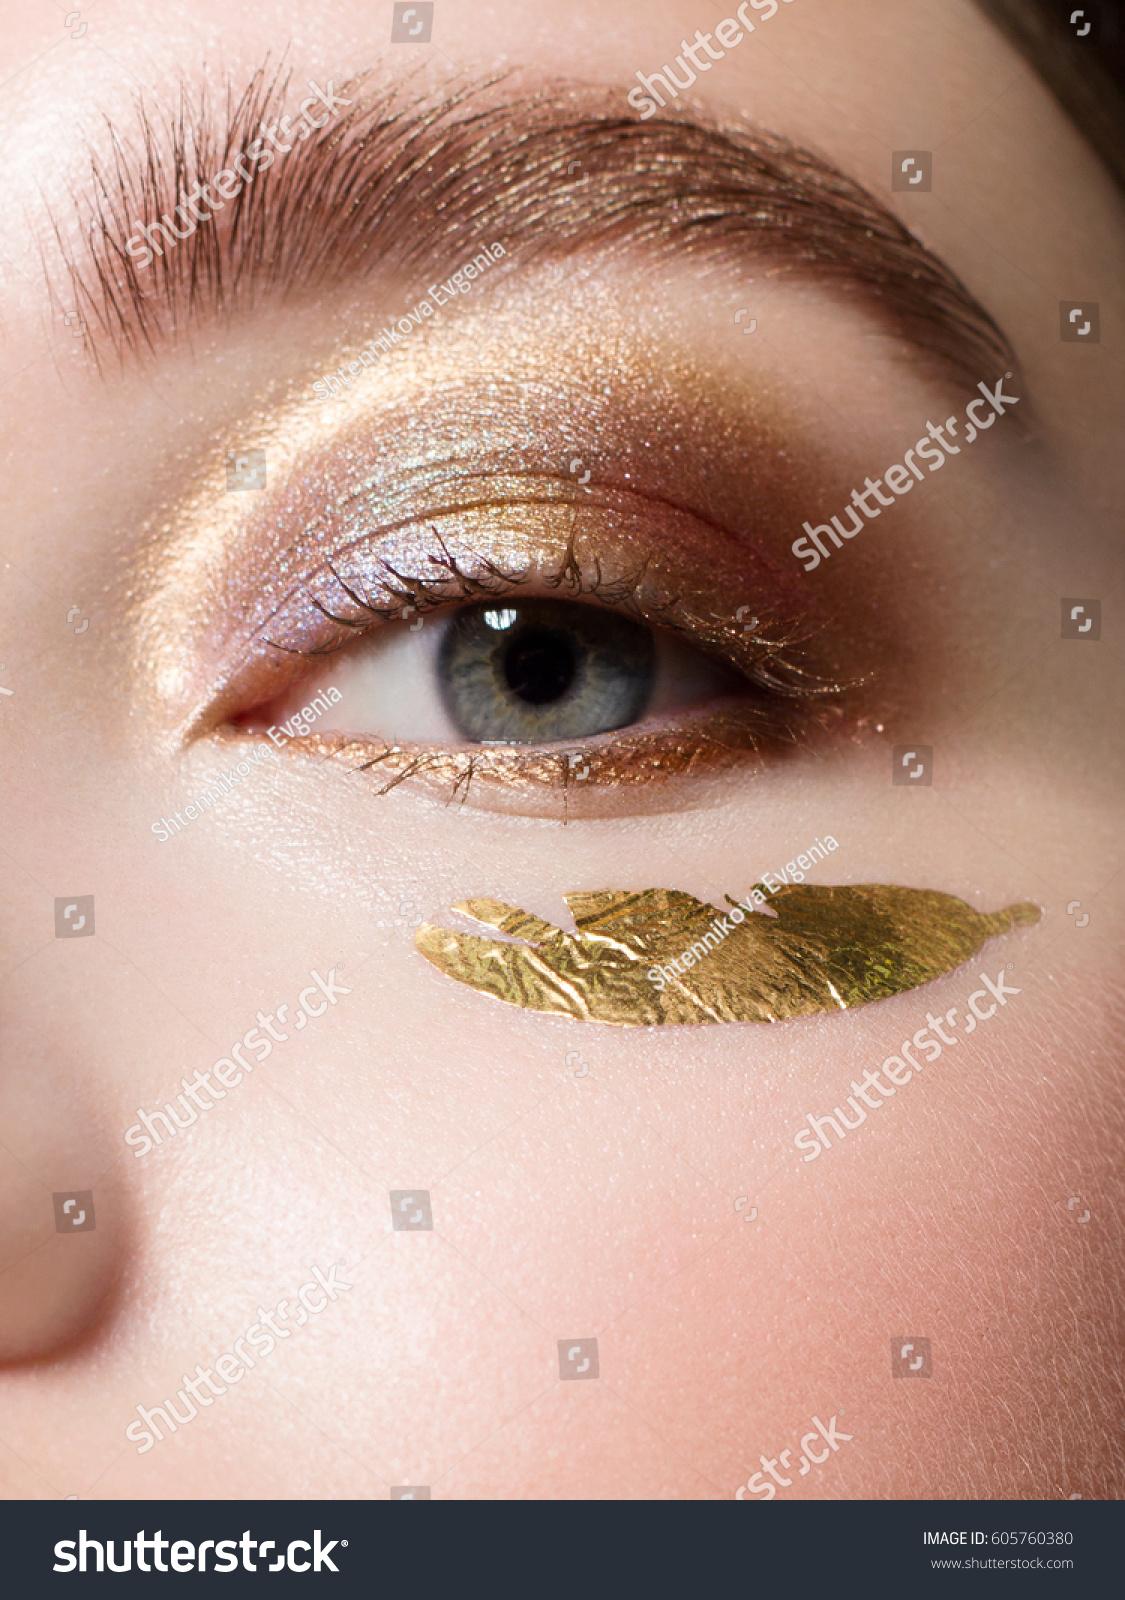 Close Beautiful Brown Eyes Decorative Cosmetics Stock Photo 605760380 - Shutterstock